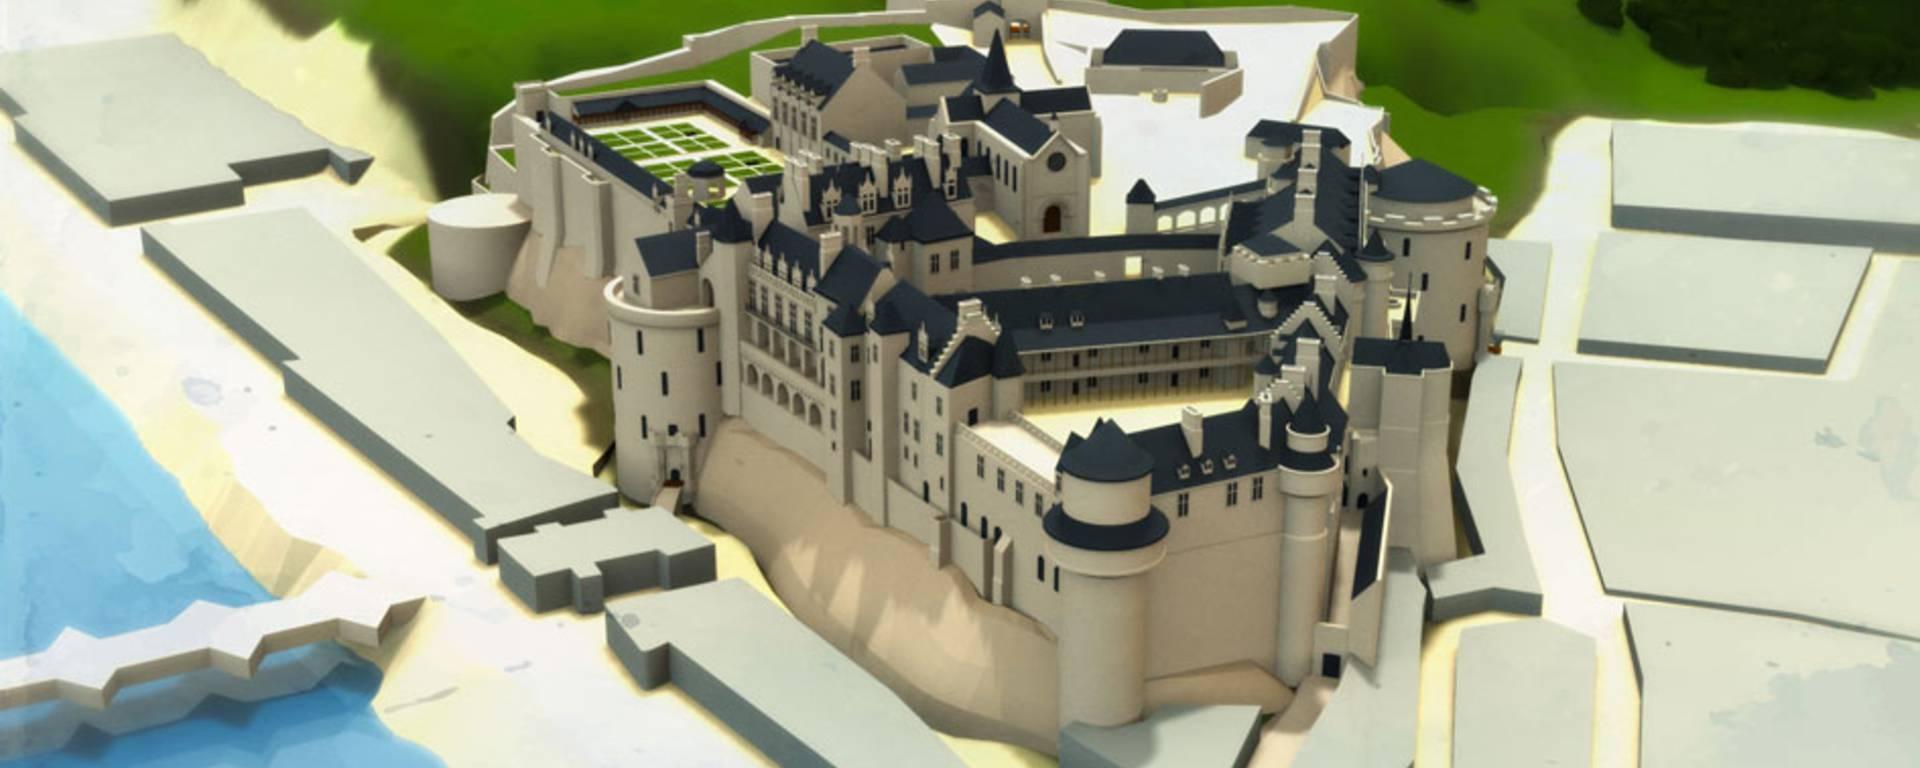 The château at the time of Catherine de Médici